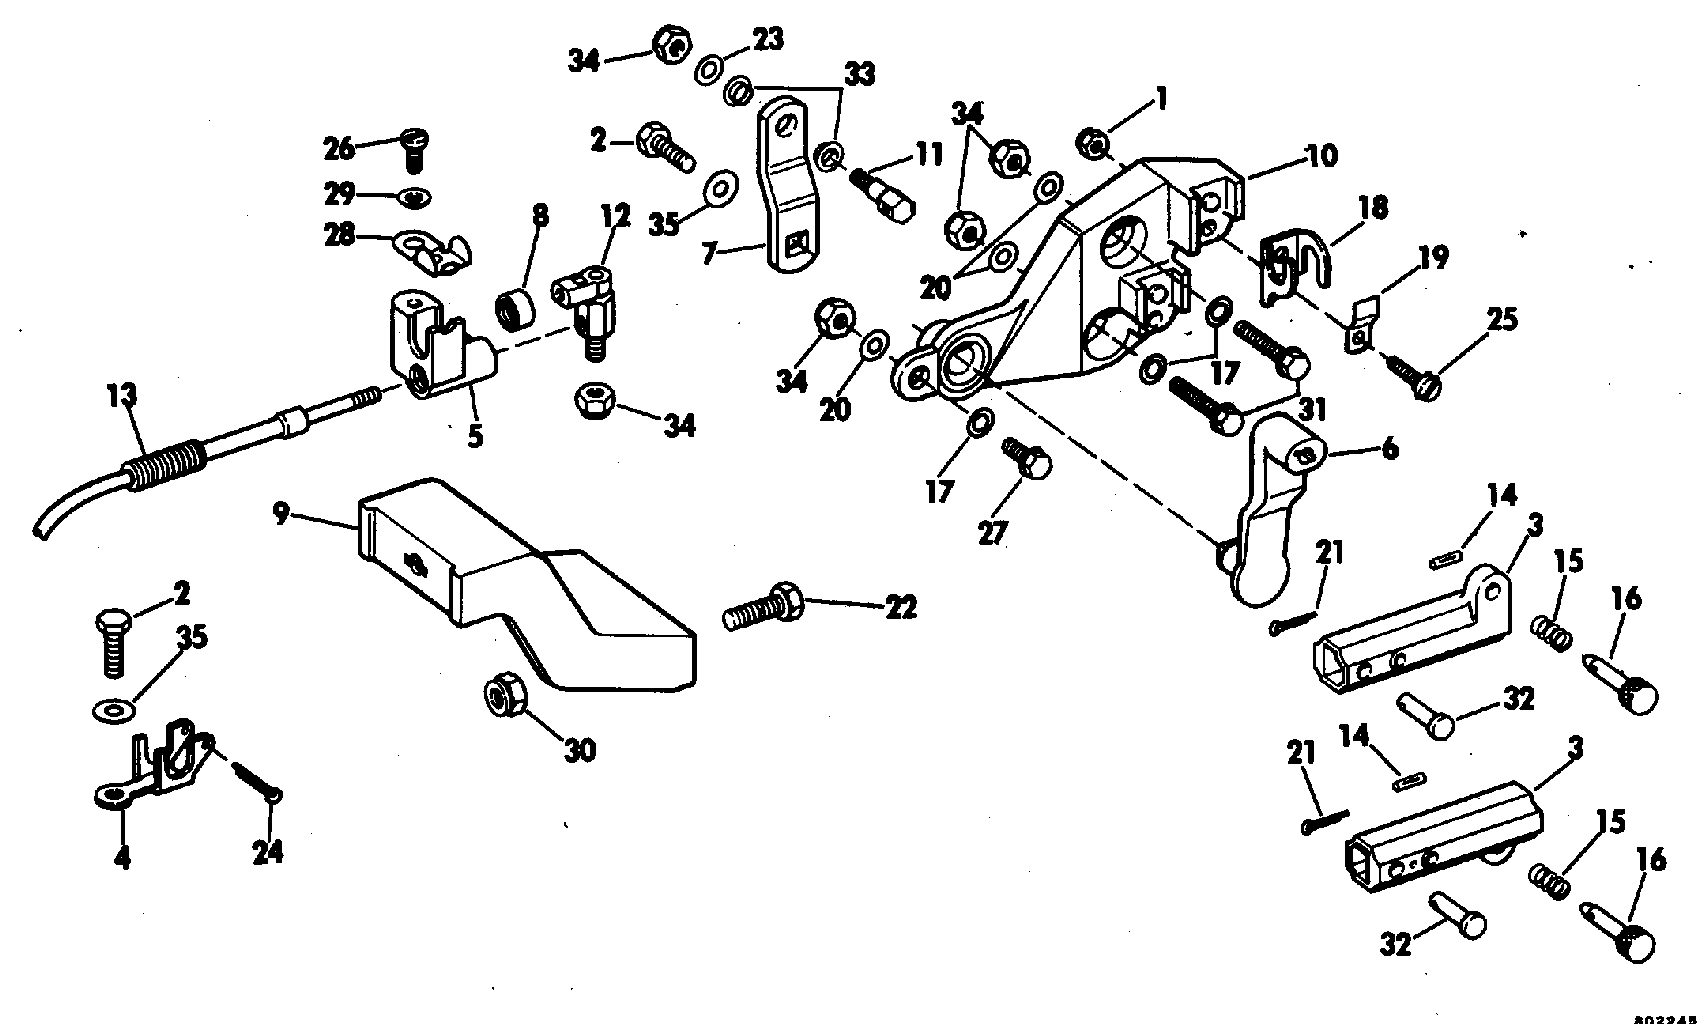 Remote Control Adaptor Kit 7 5 Remote Control